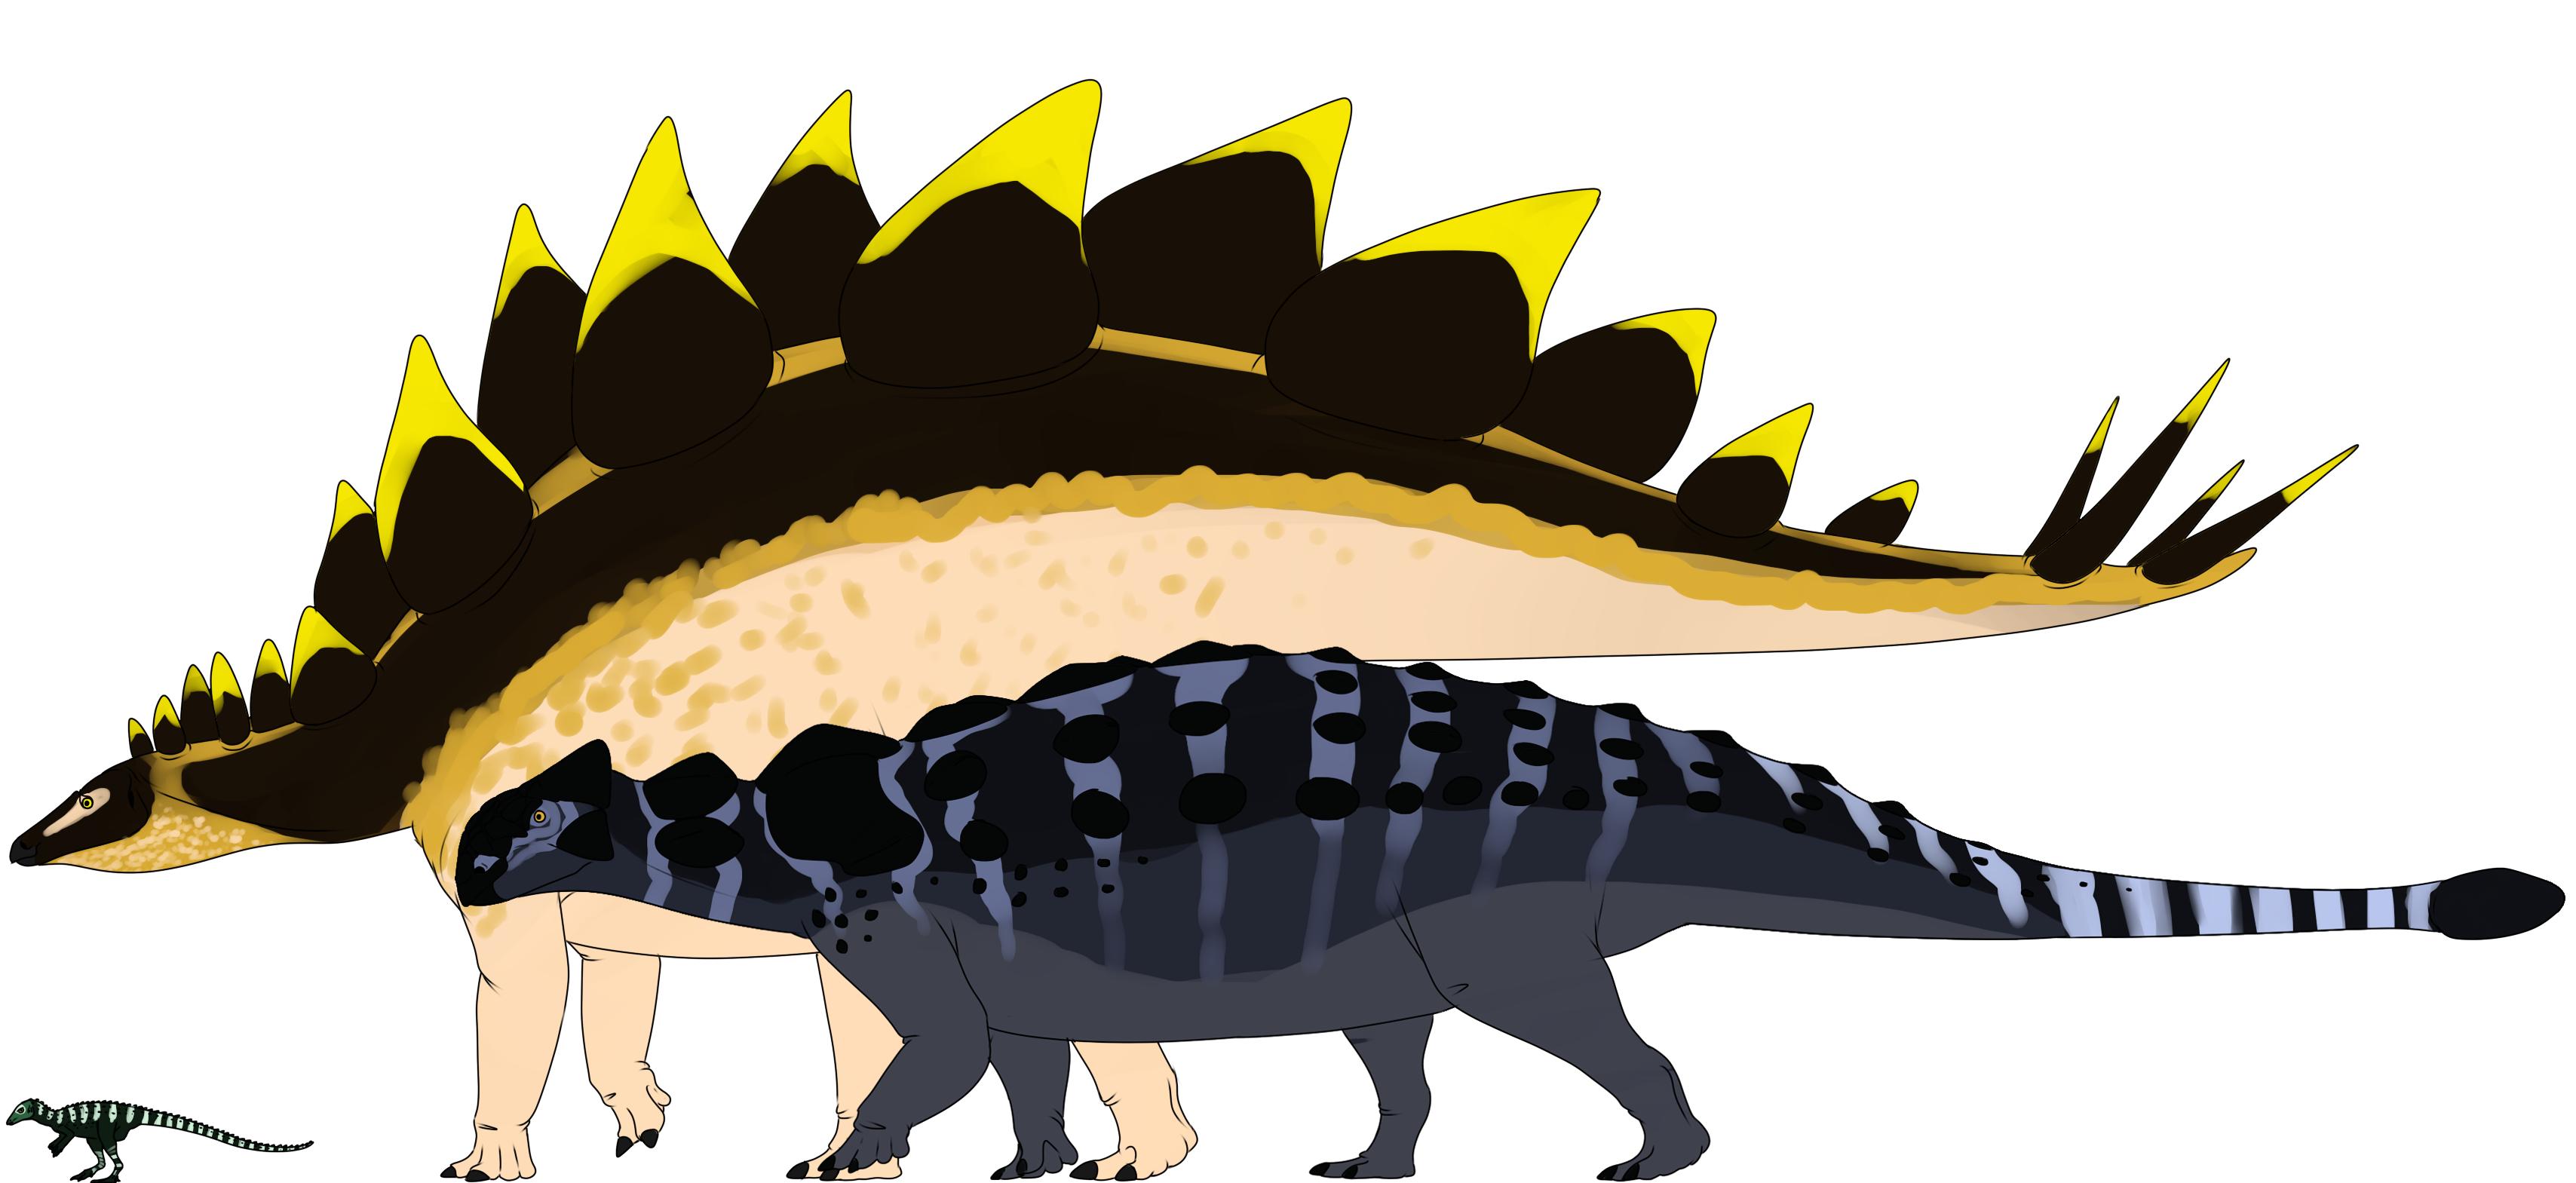 scutellosaurus__stegosaurus__ankylosaurus_by_stygimolochspinifer-d5una4i.png